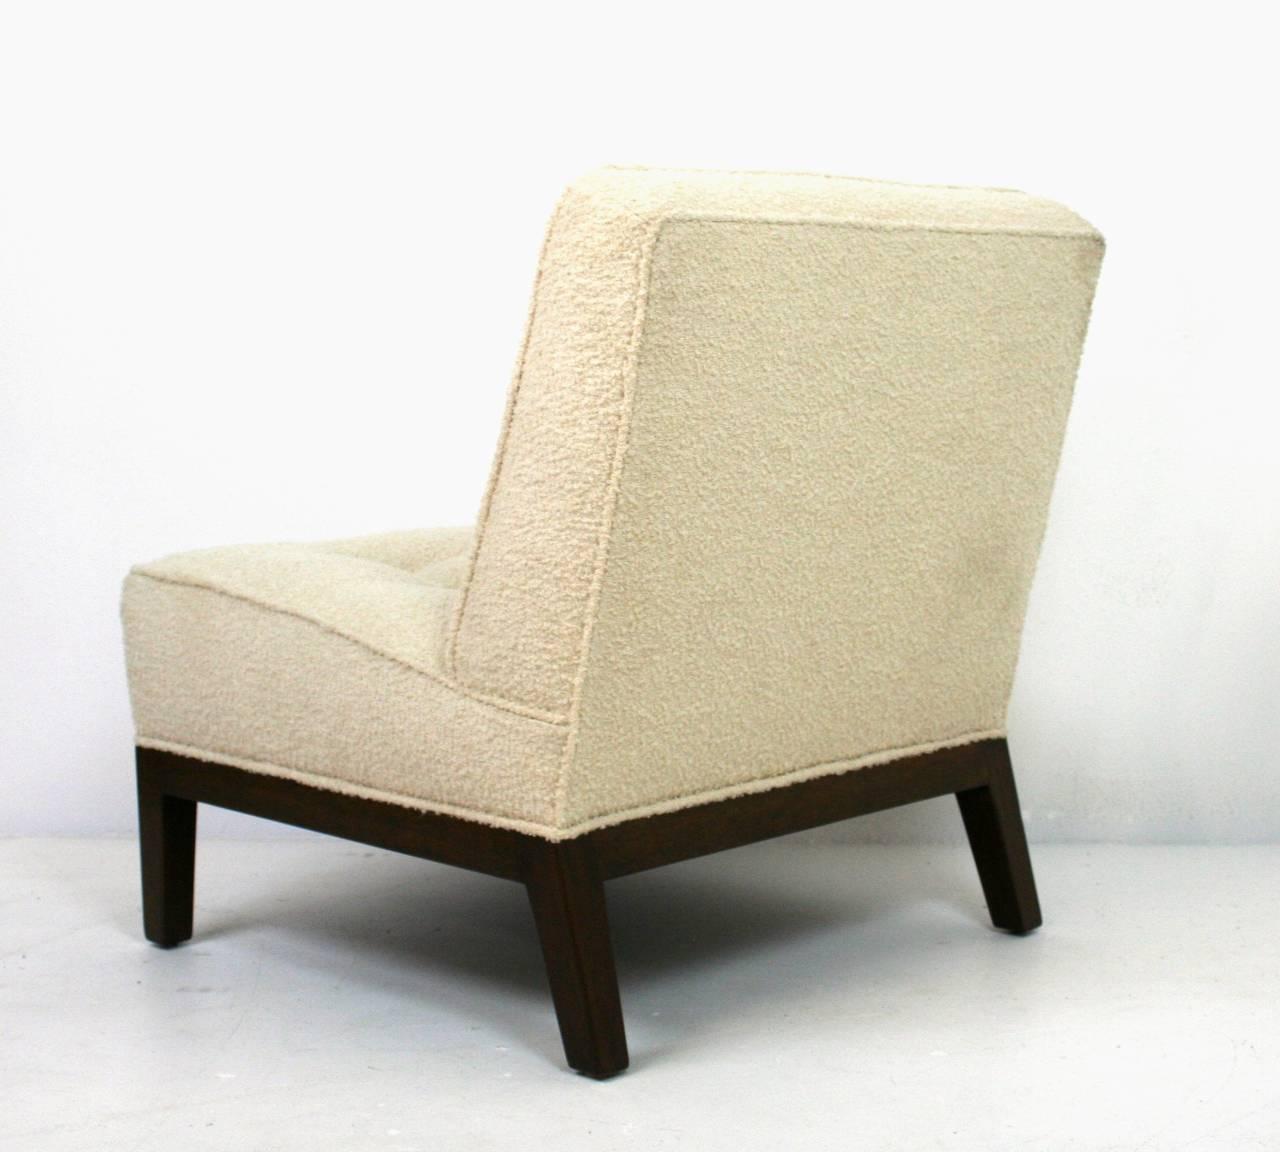 Dunbar slipper chair for sale at 1stdibs for Slipper chair